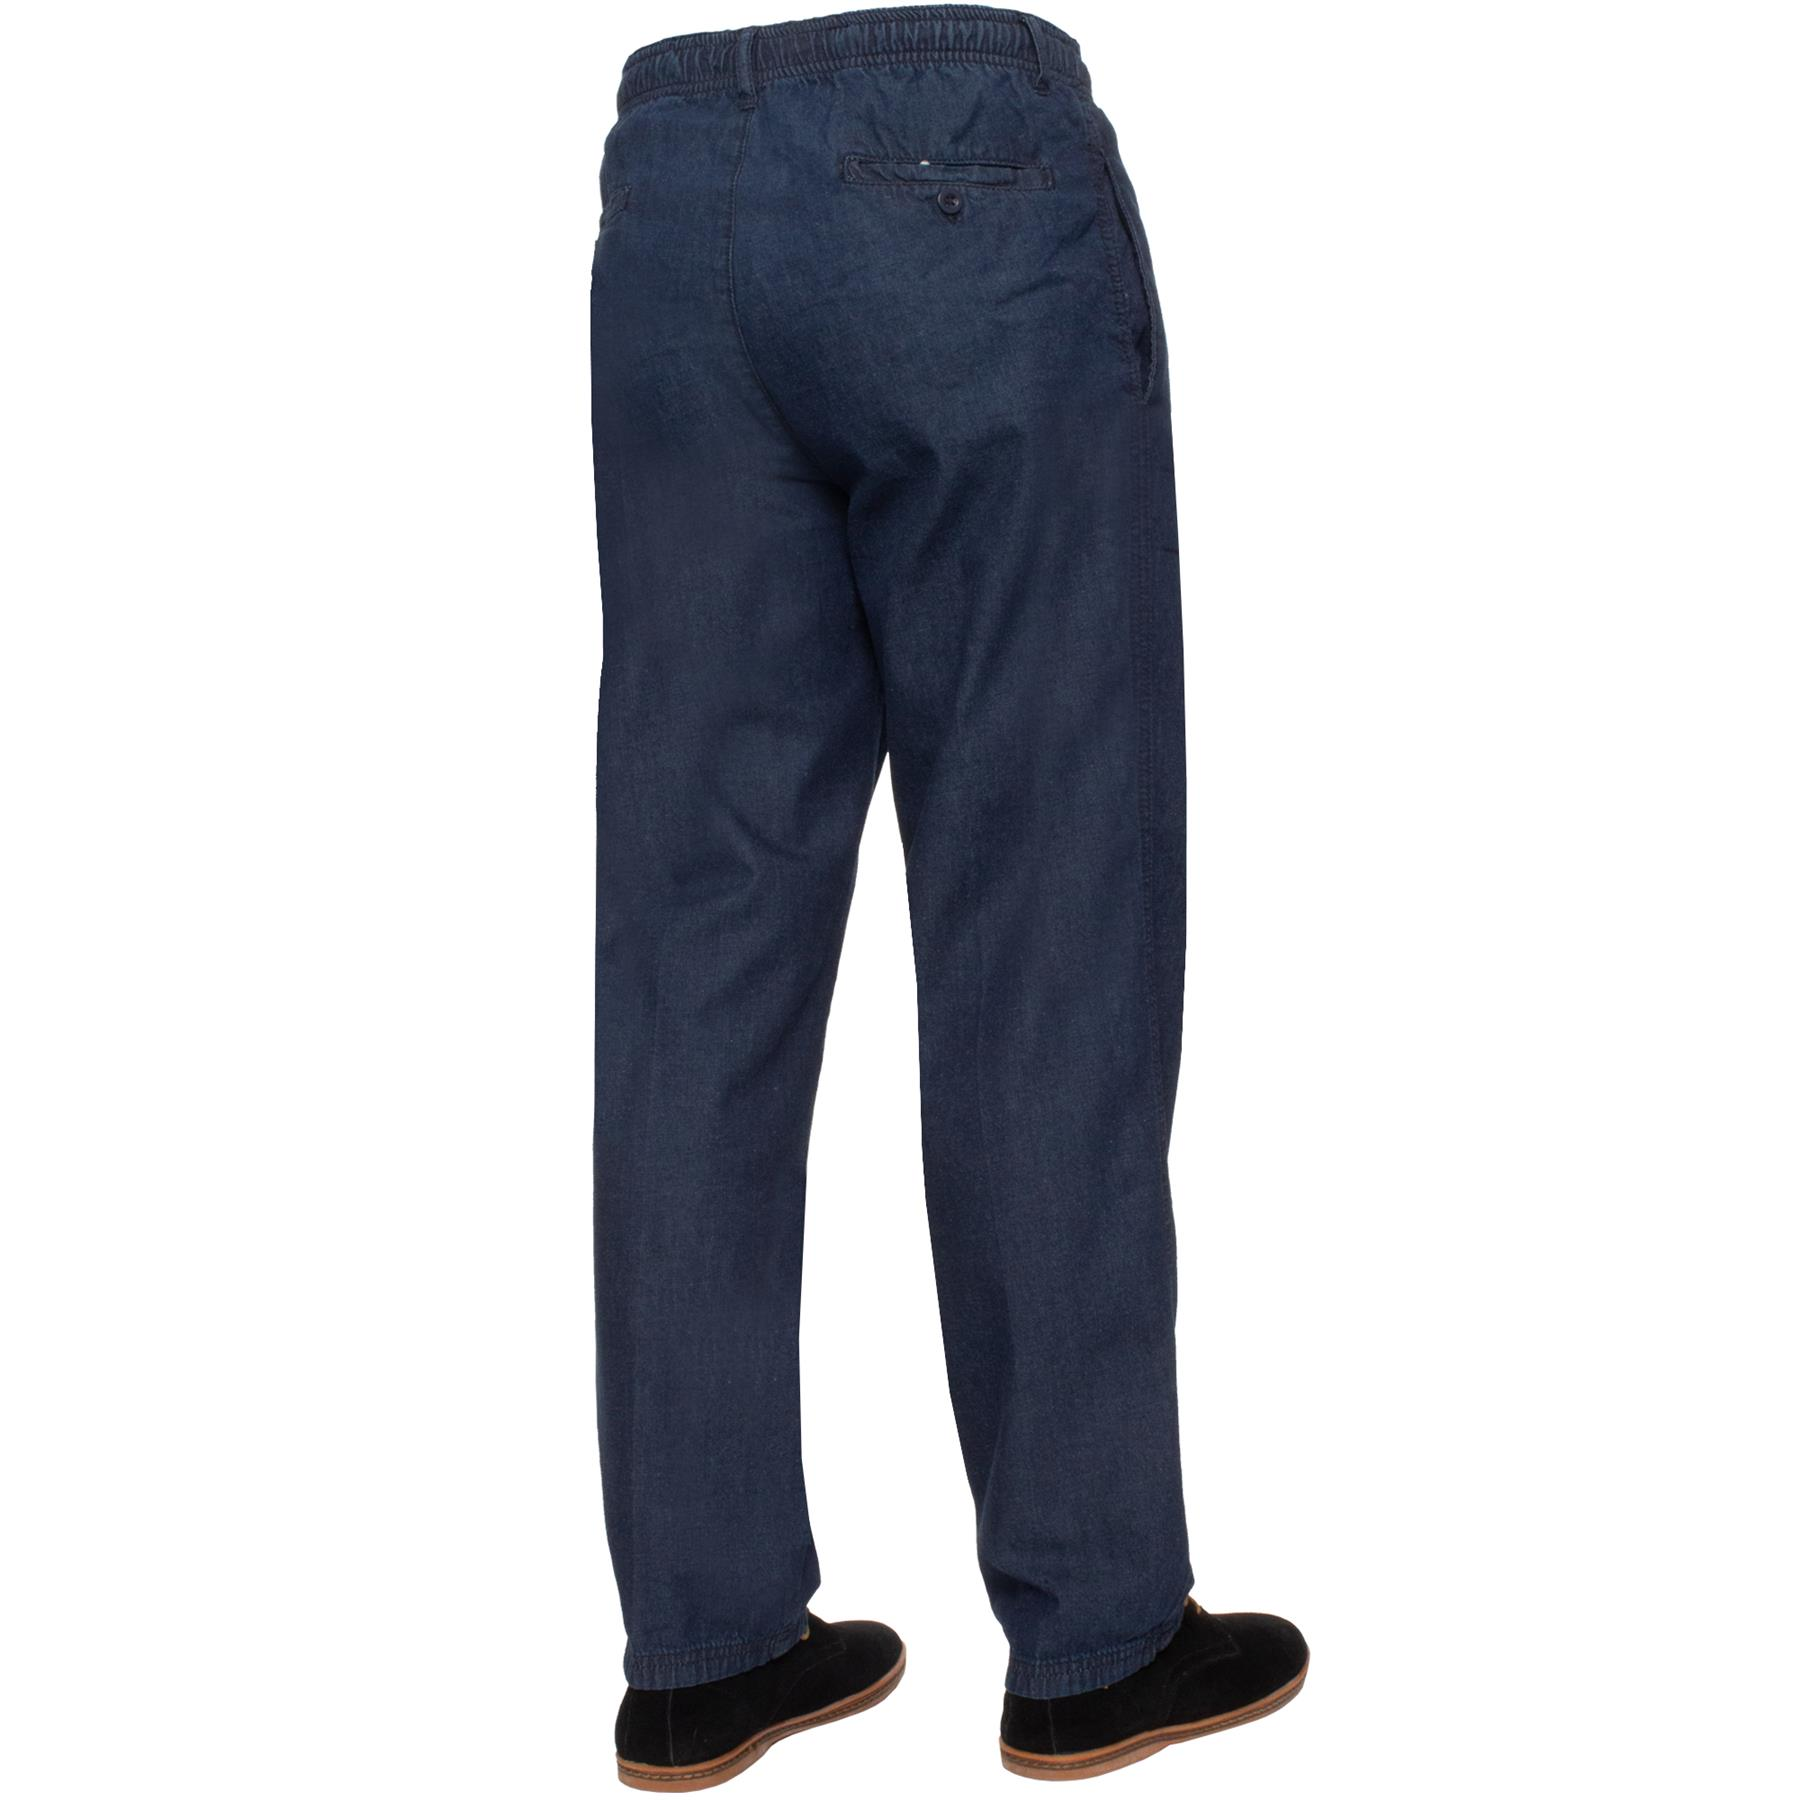 Para-Hombres-Pantalones-De-Rugby-Kruze-cintura-elastica-con-cordon-pantalones-REGULAR-King-Tamanos miniatura 22